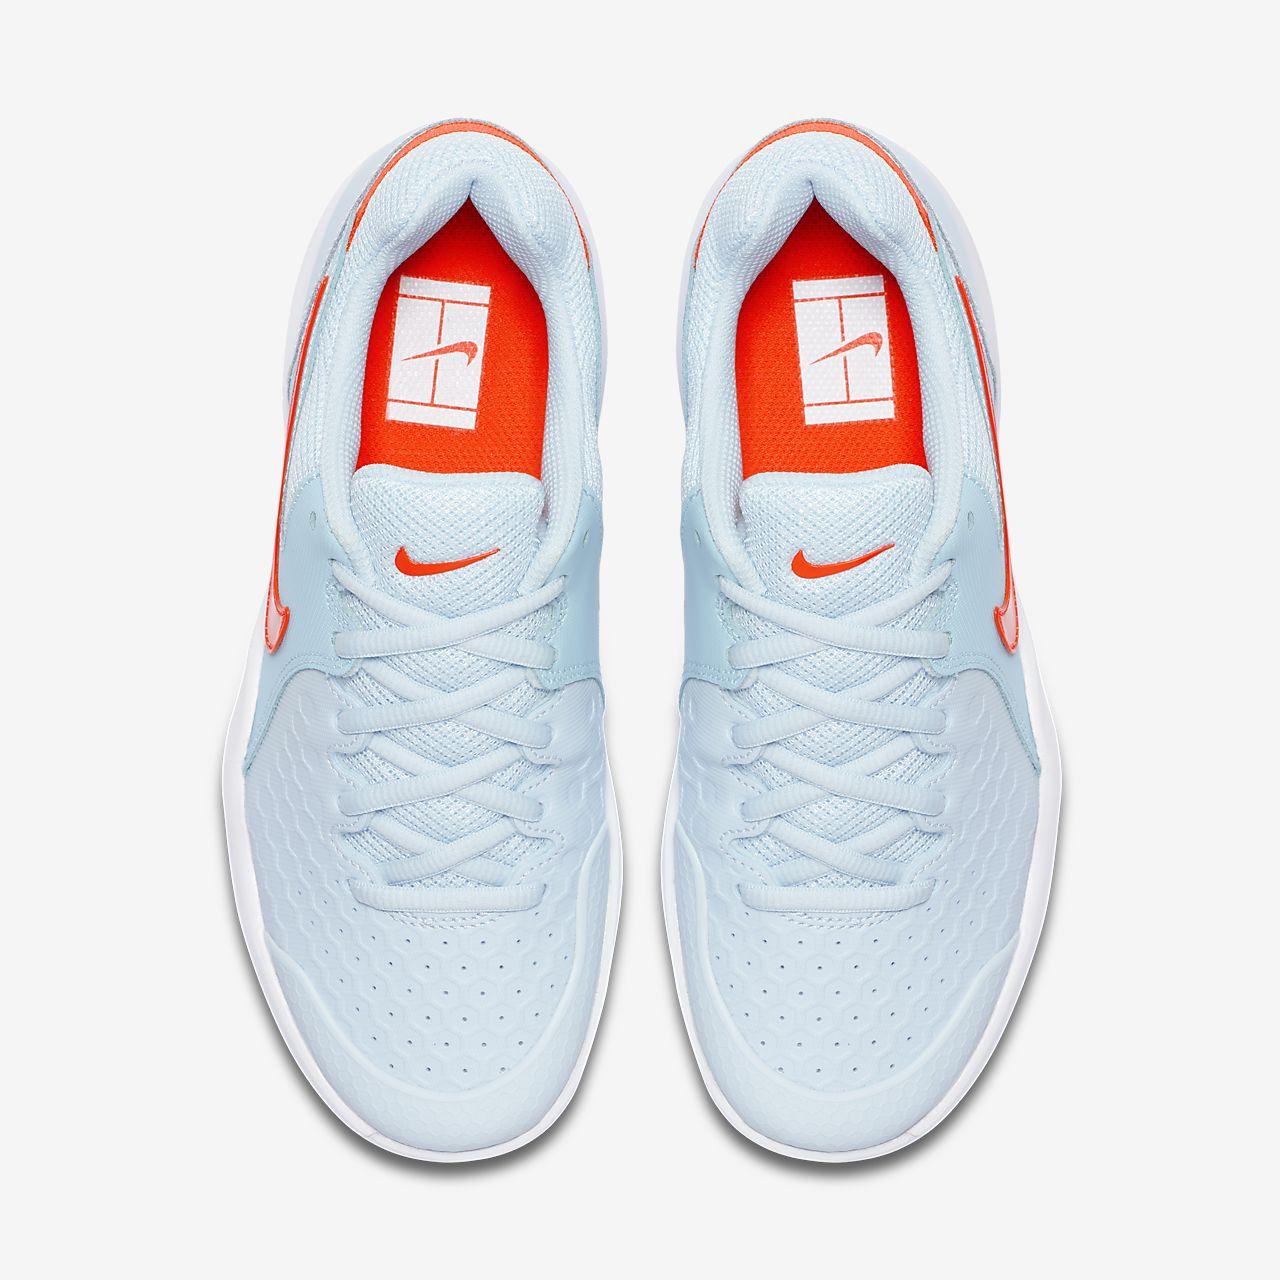 94acd0ad25fd11 NikeCourt Air Zoom Resistance Women s Hard Court Tennis Shoe. Nike ...